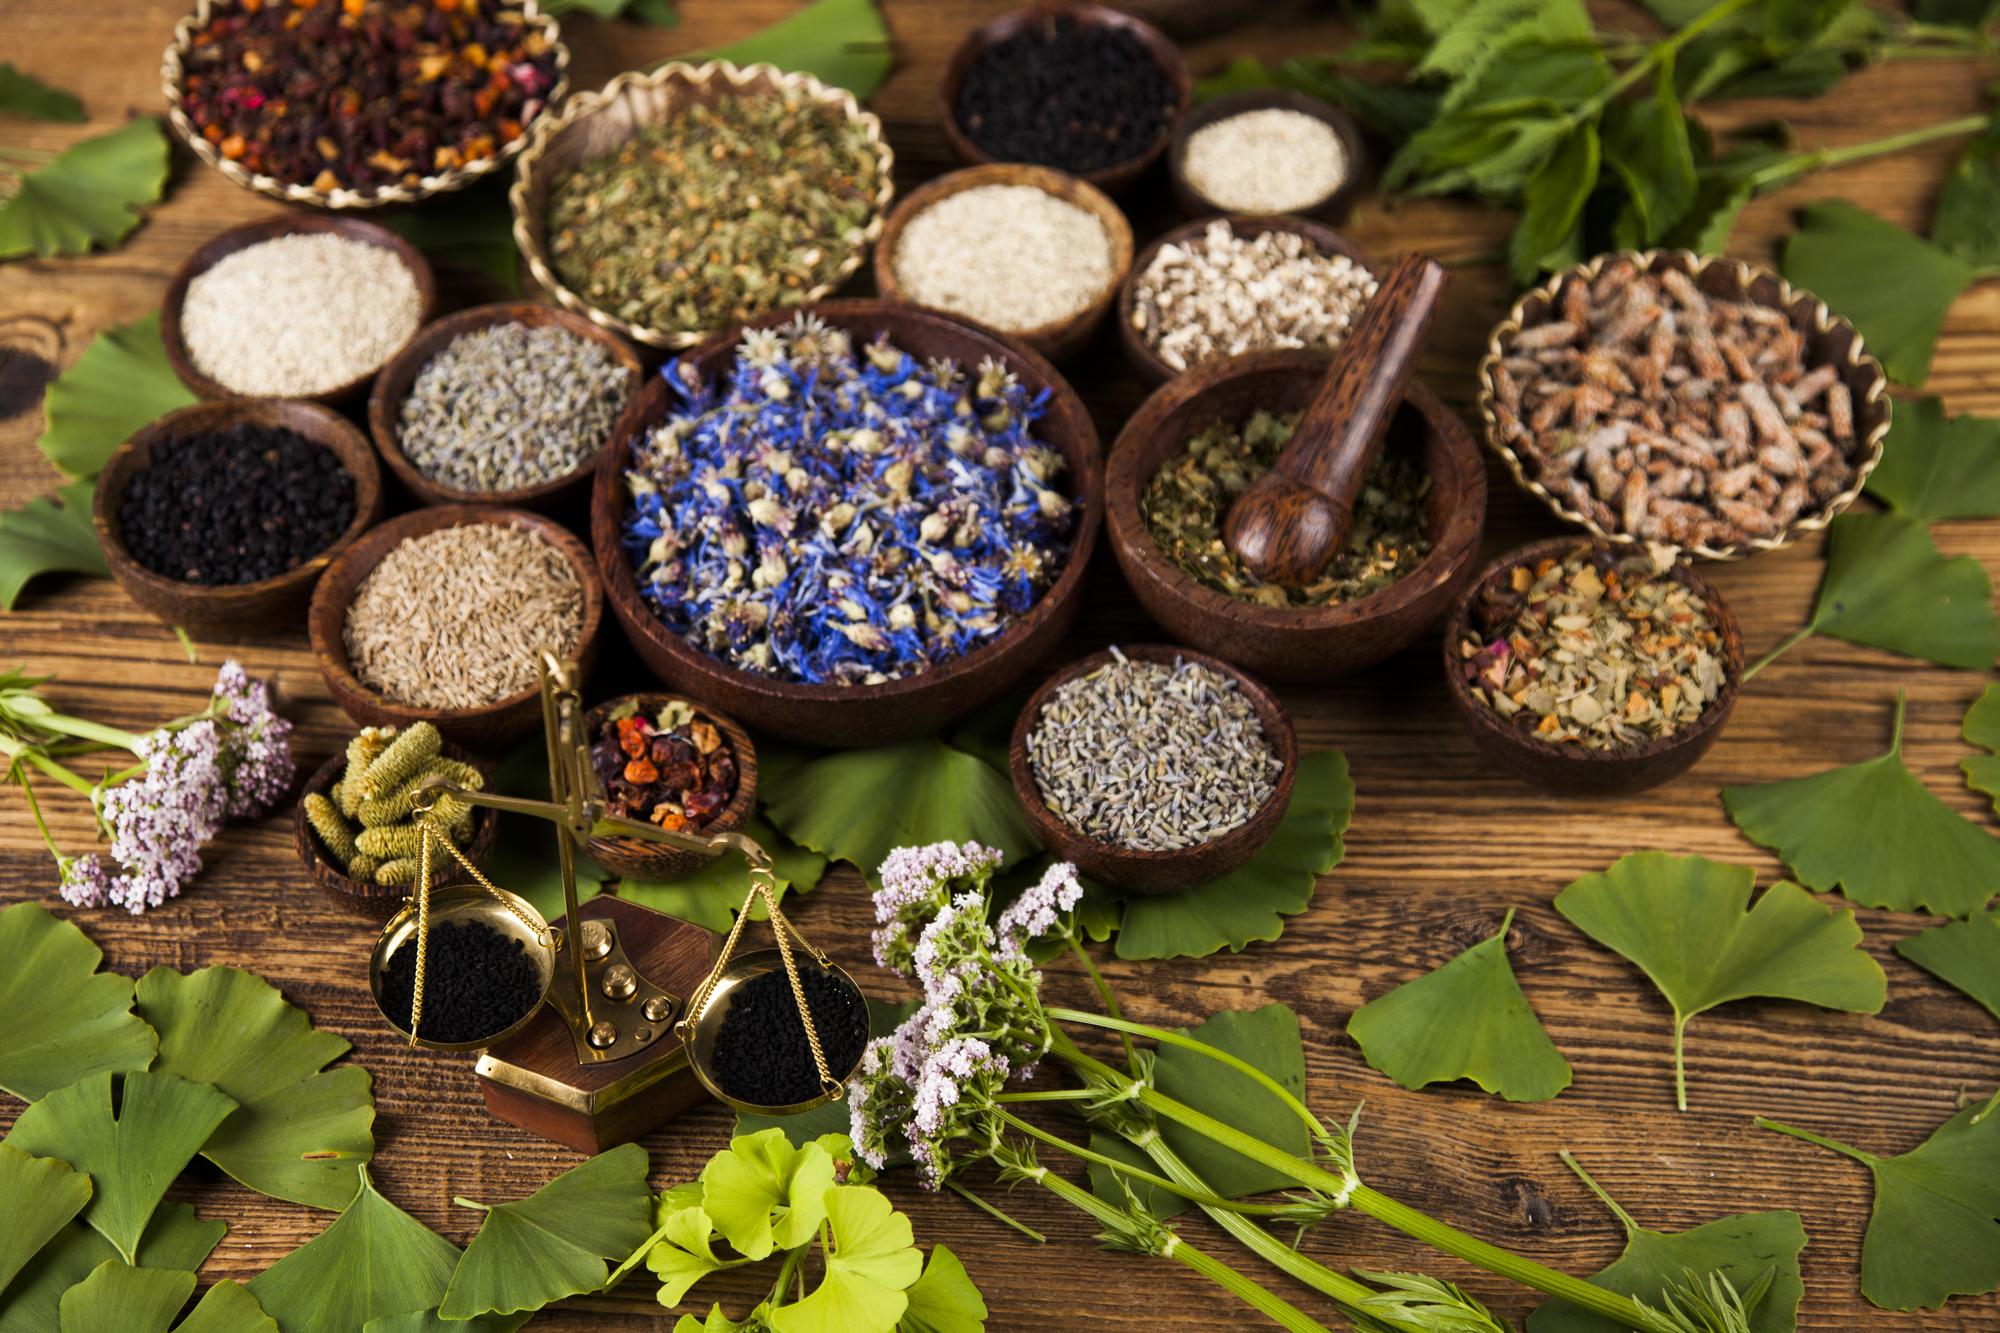 Natural medicine, wooden table background